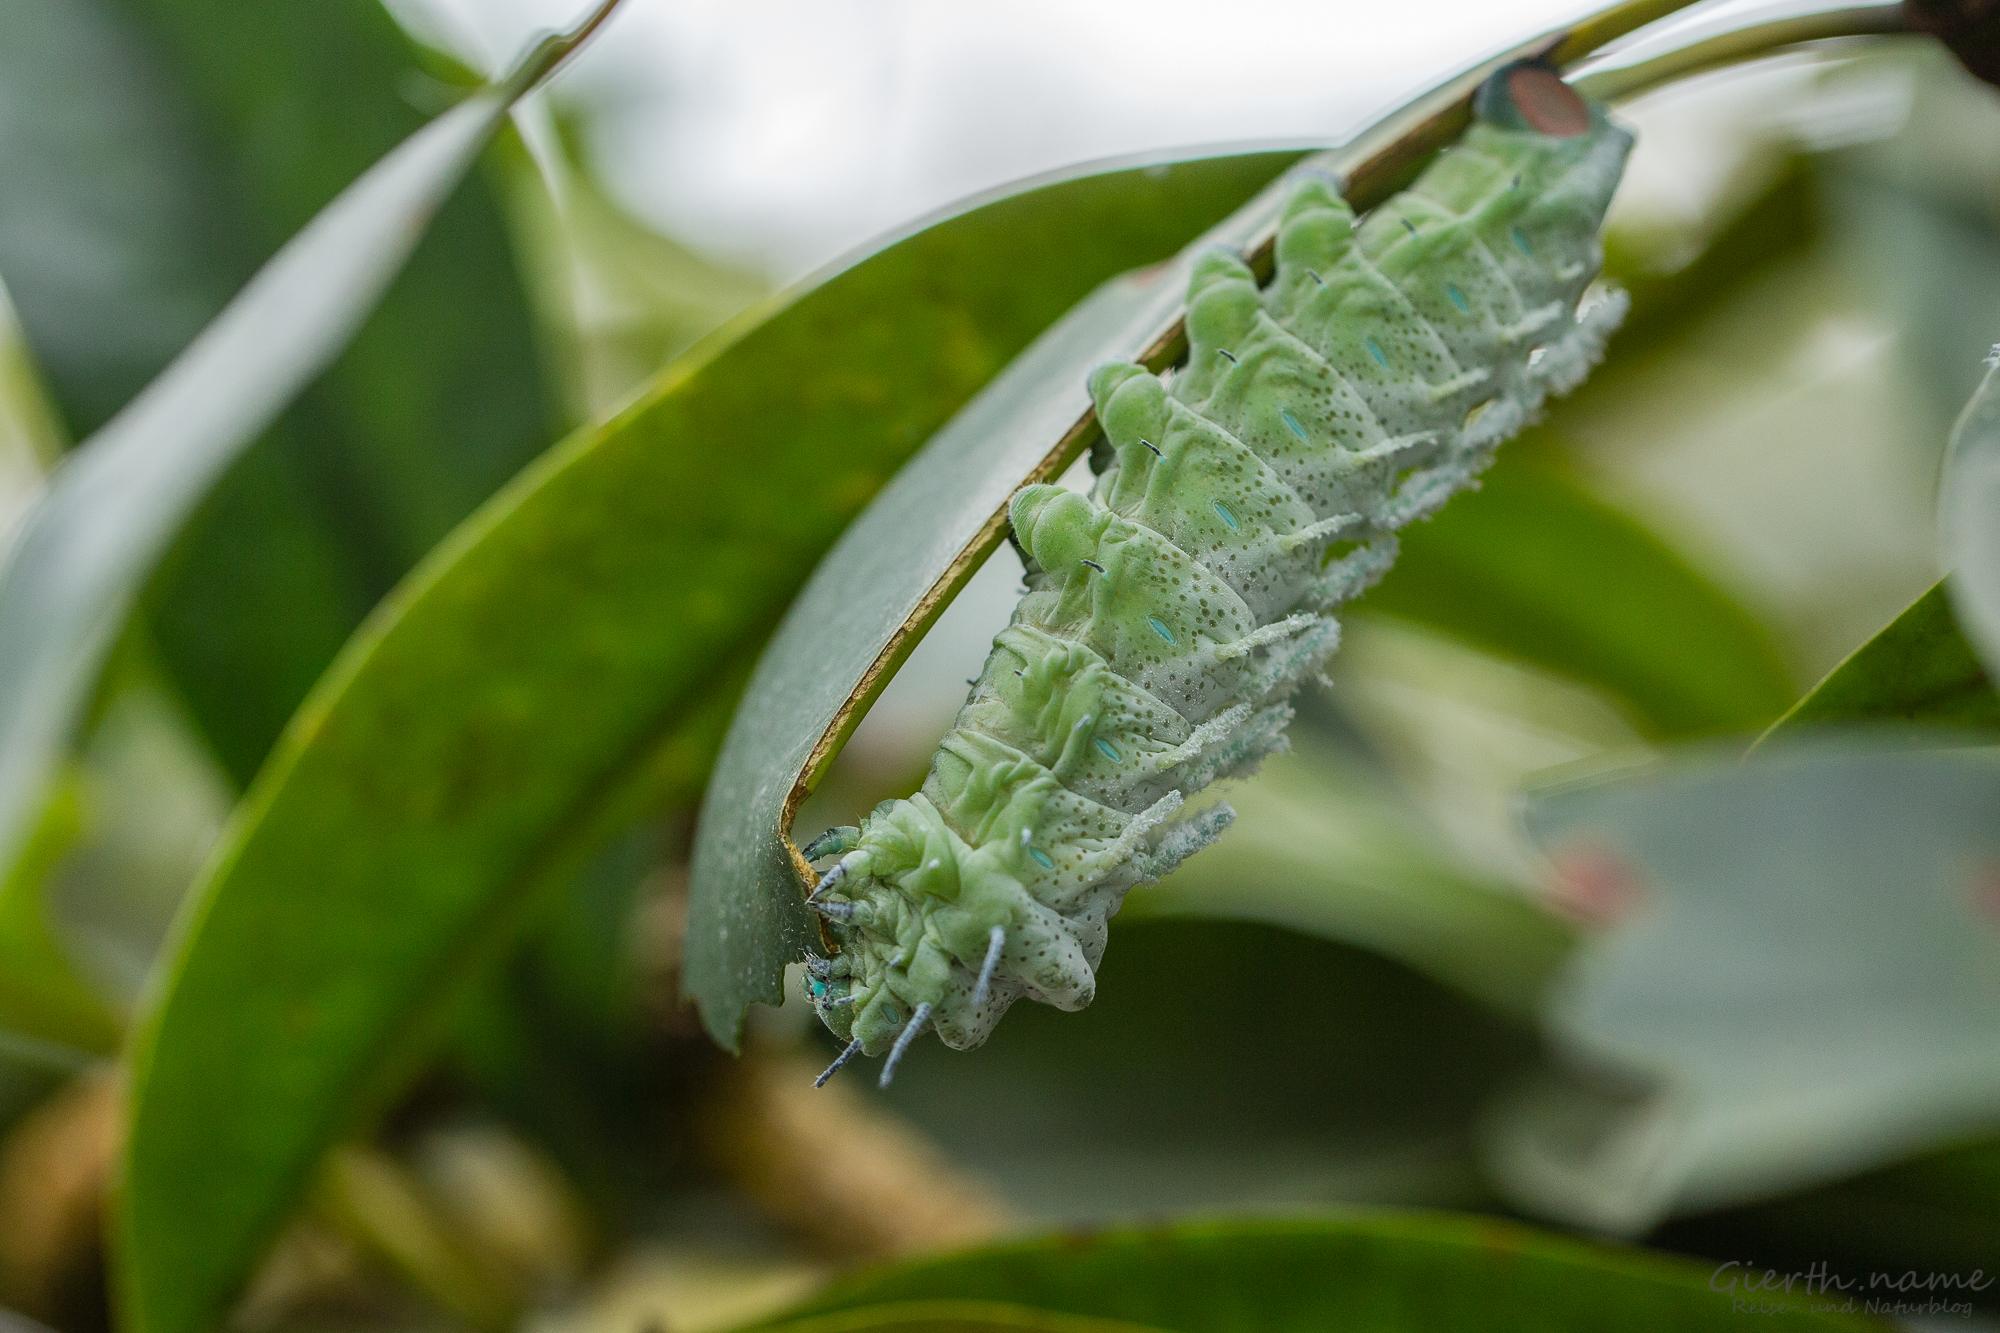 Raupen des Atlasspinners im Botanischen Garten München